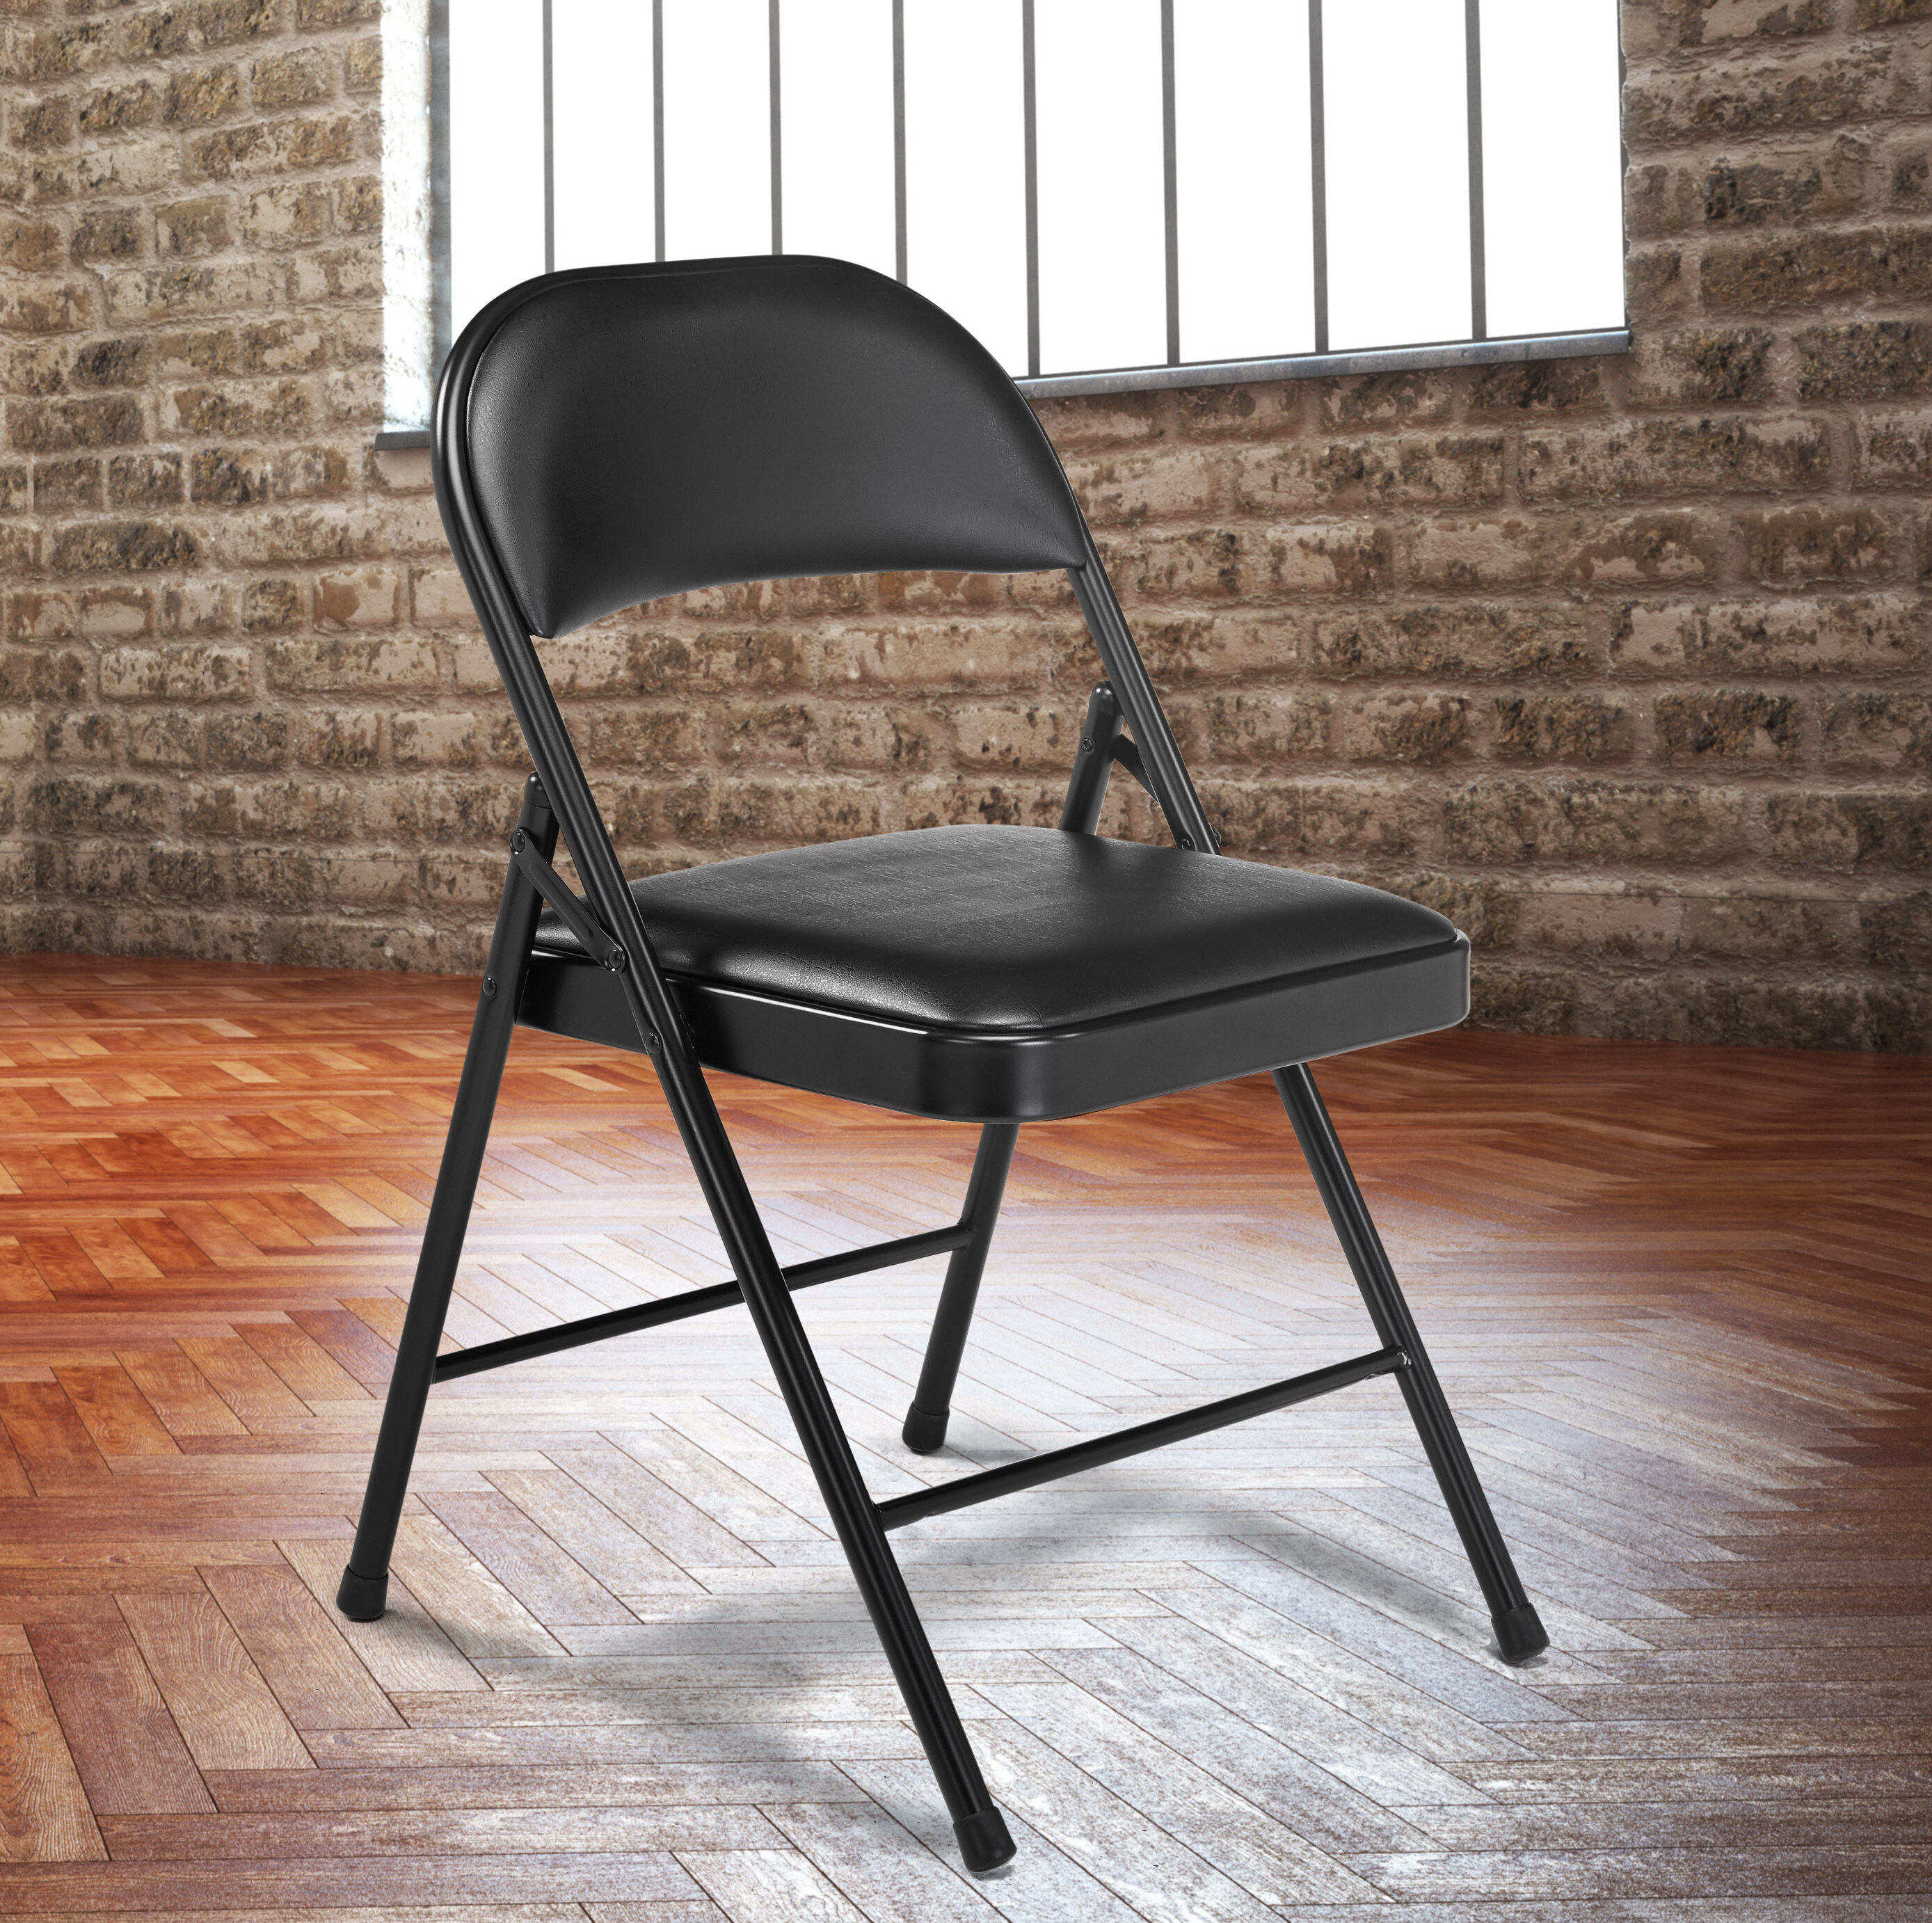 National Public Seating Commercialine Vinyl Padded Folding Chair U0026 Reviews  | Wayfair